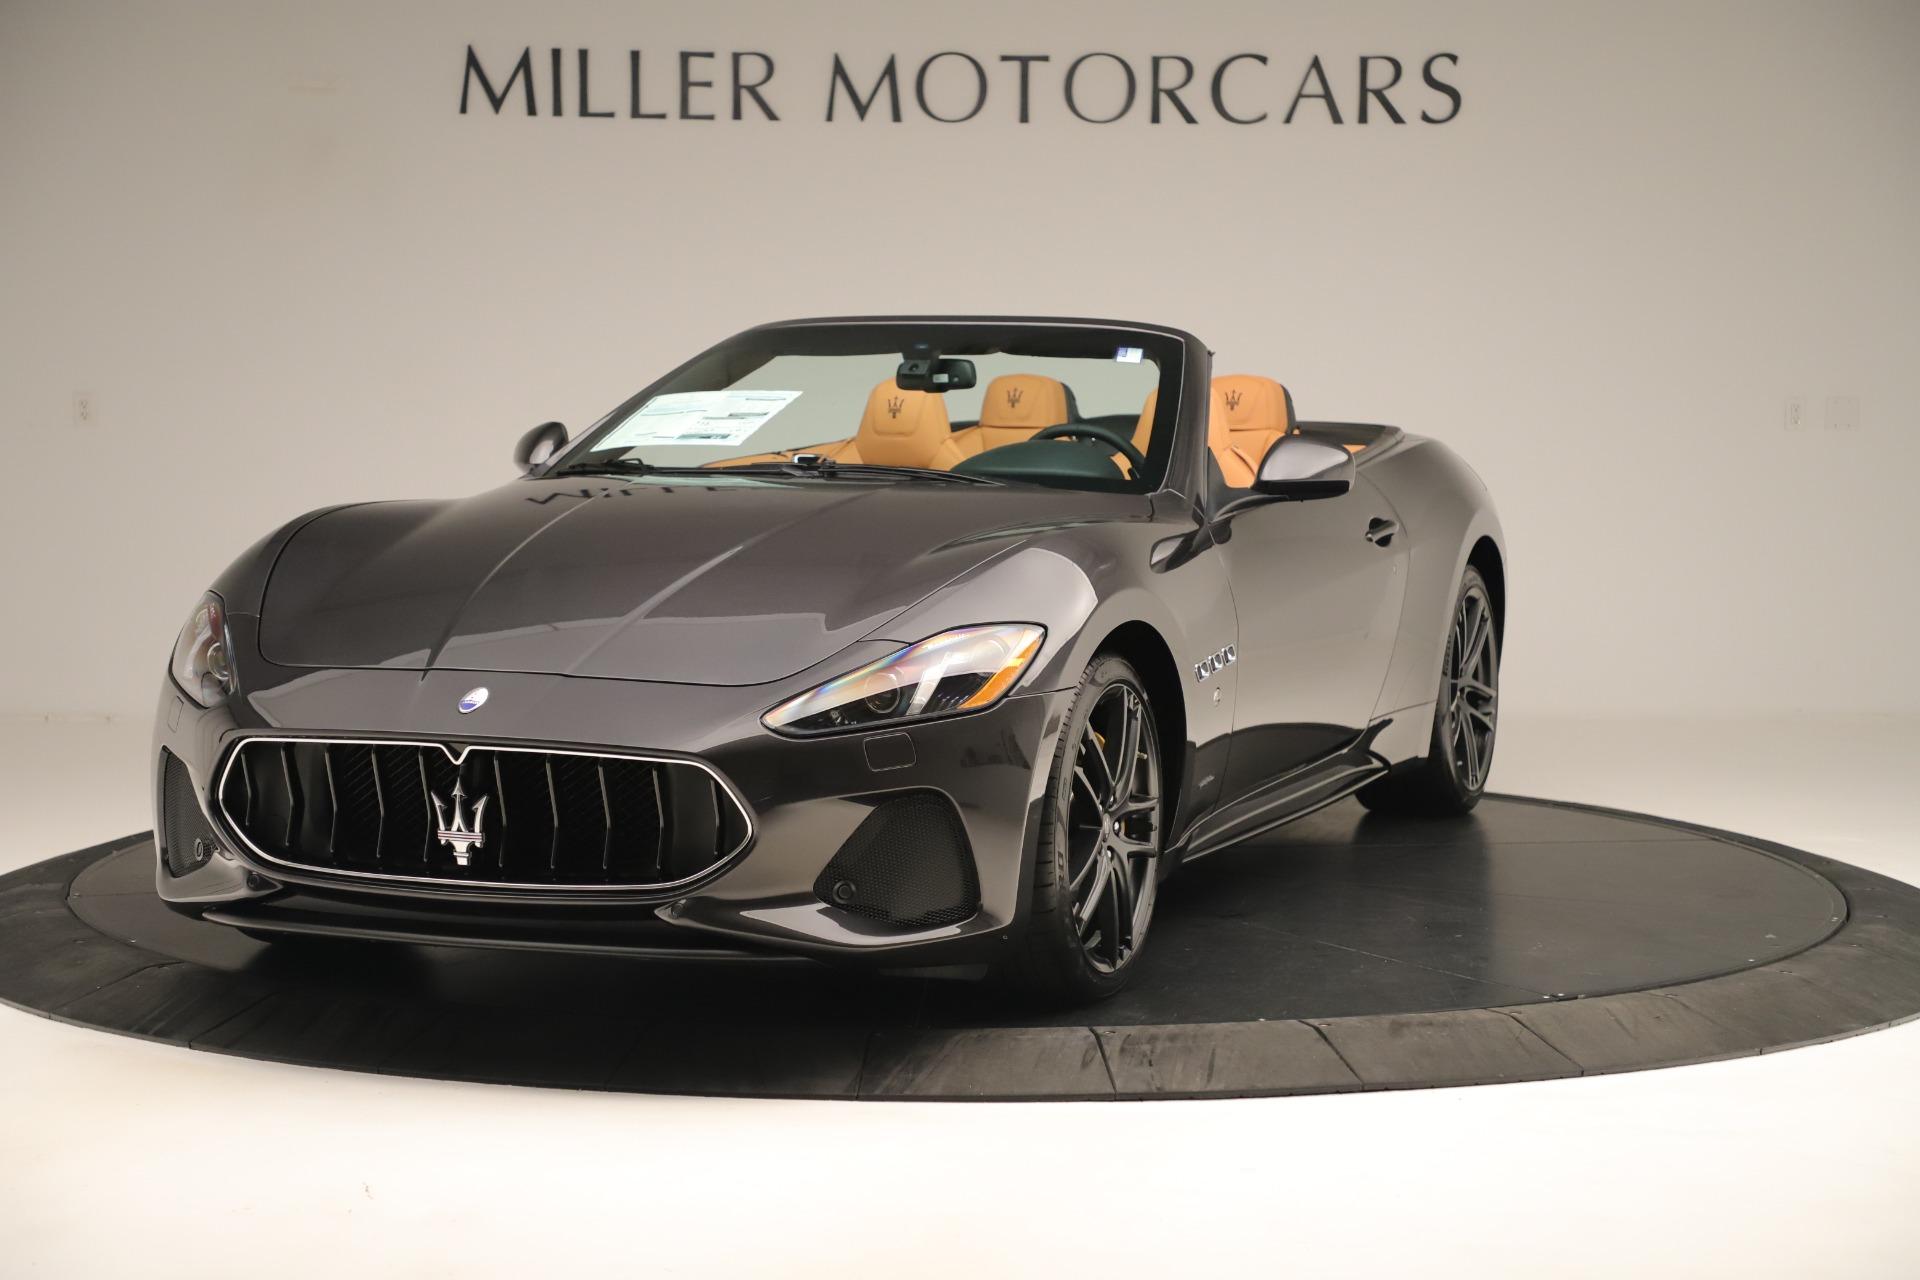 New 2019 Maserati GranTurismo Sport Convertible for sale $163,845 at McLaren Greenwich in Greenwich CT 06830 1